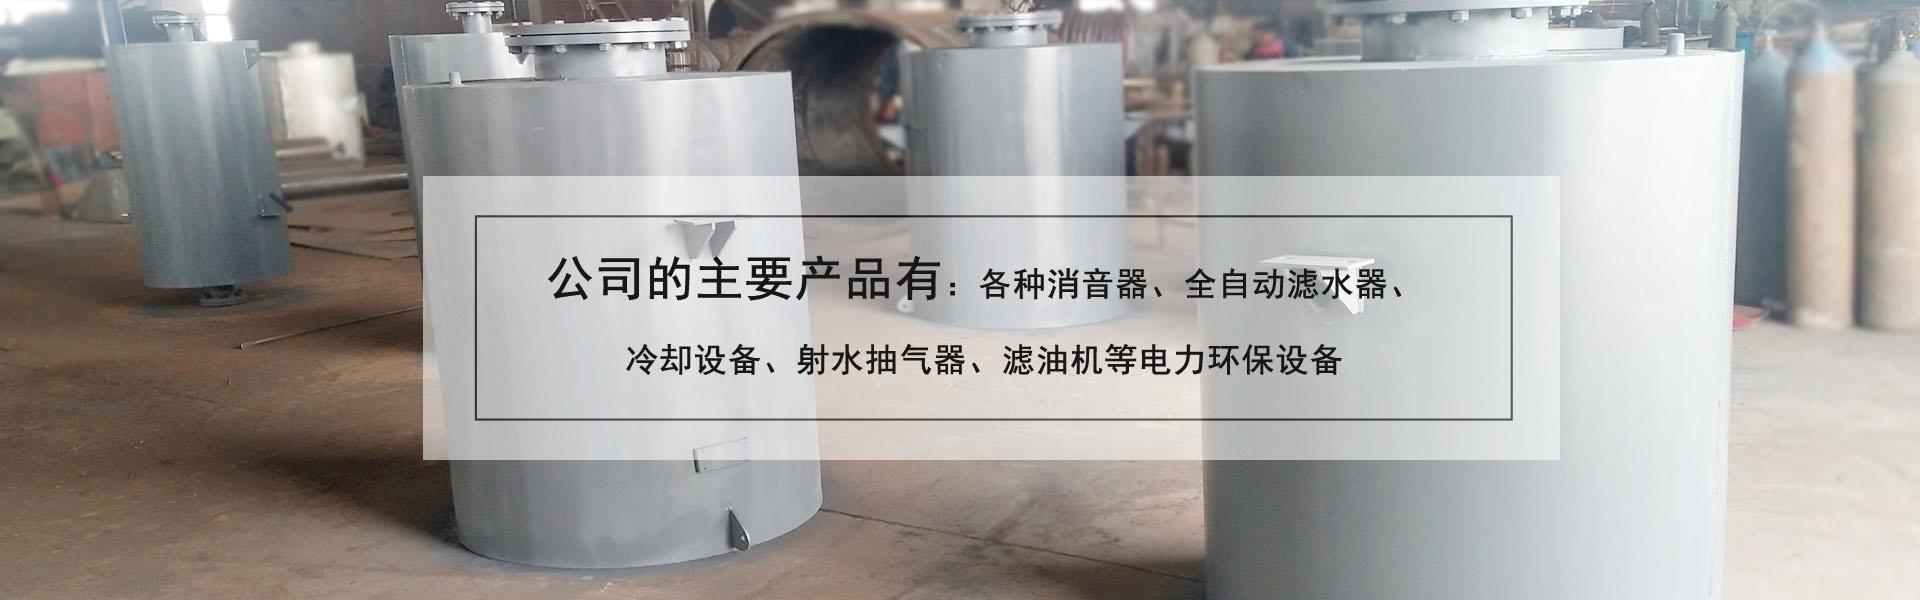 lianyungangshi柏linyu乐机xieshe备有限公司